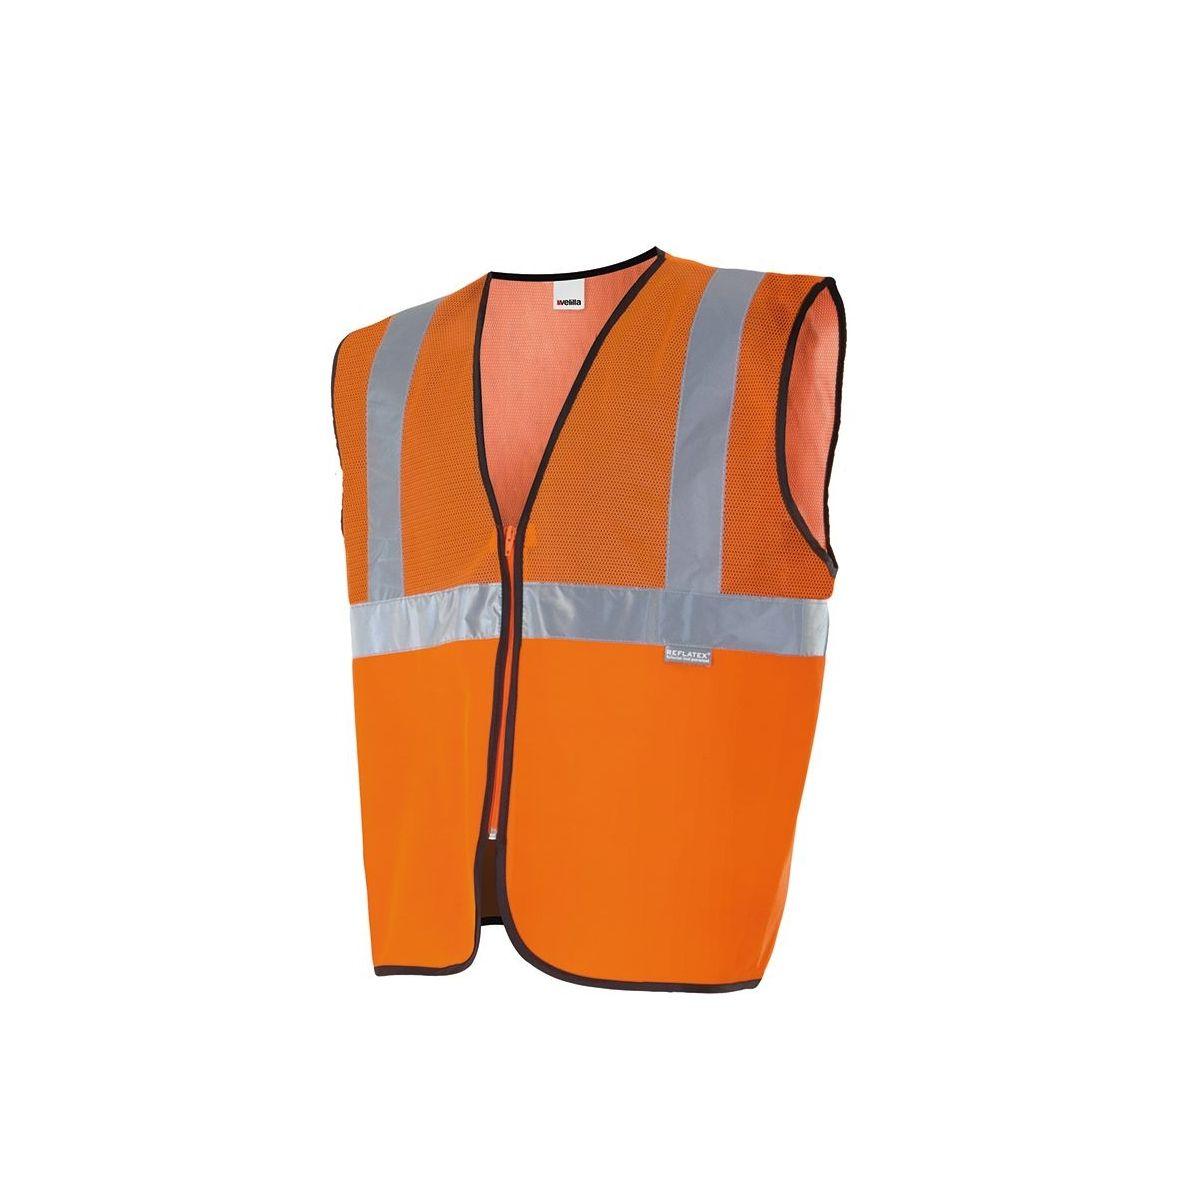 Chaleco profesional con tejido rejilla alta visibilidad (ref: 146)